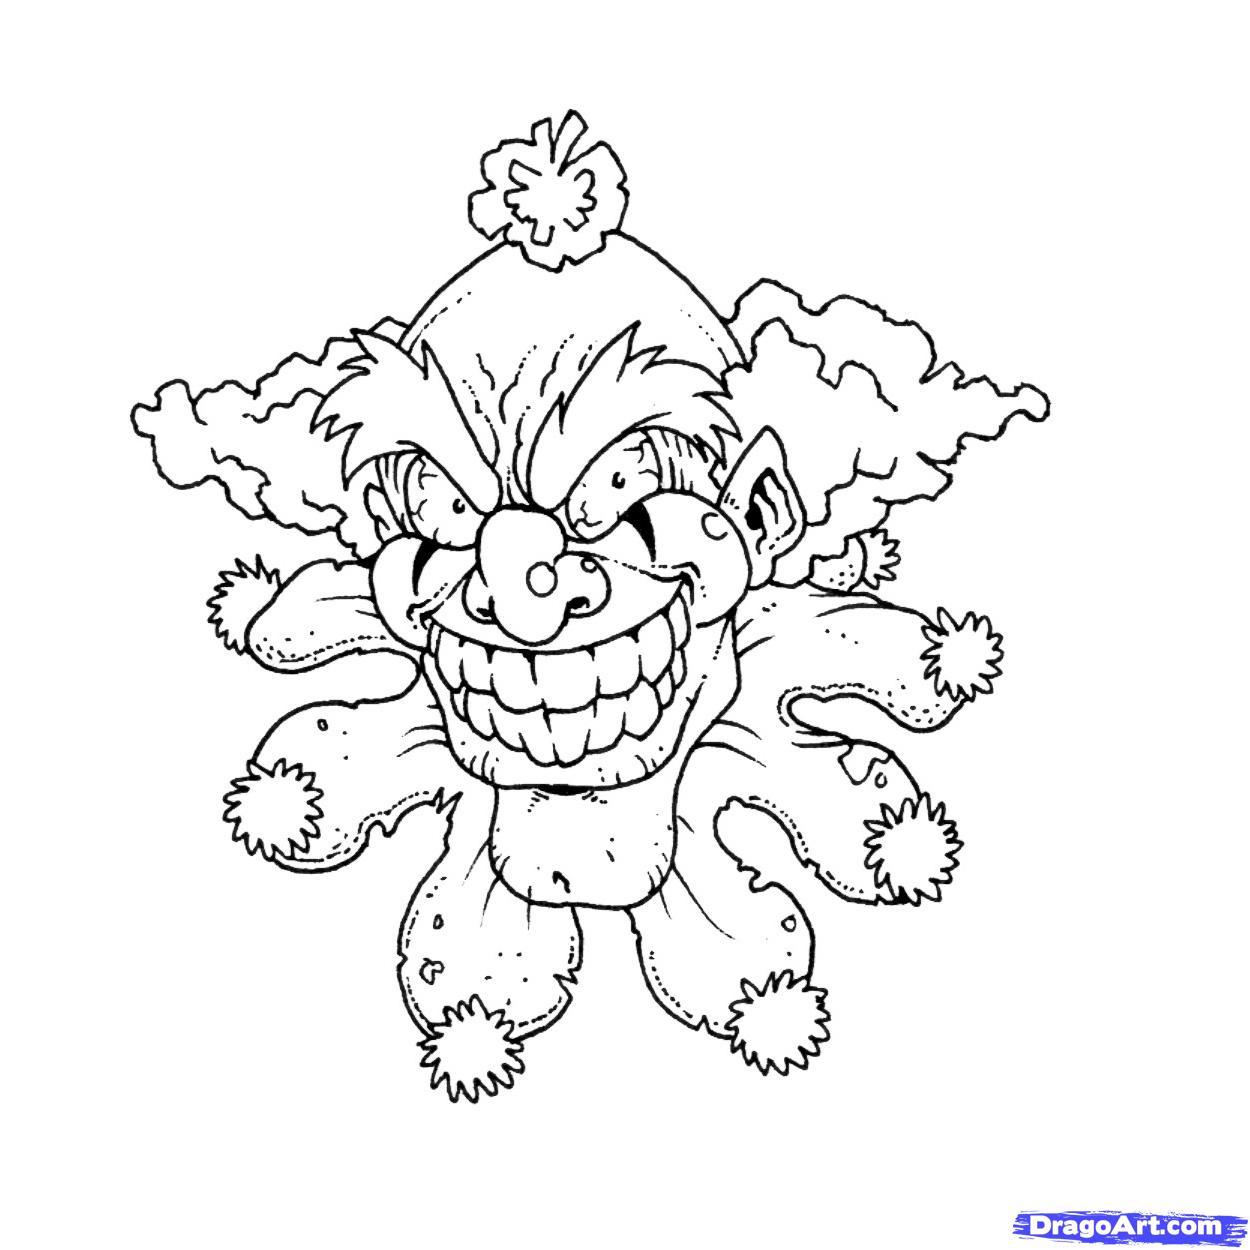 1250x1250 Evil Clown Drawings